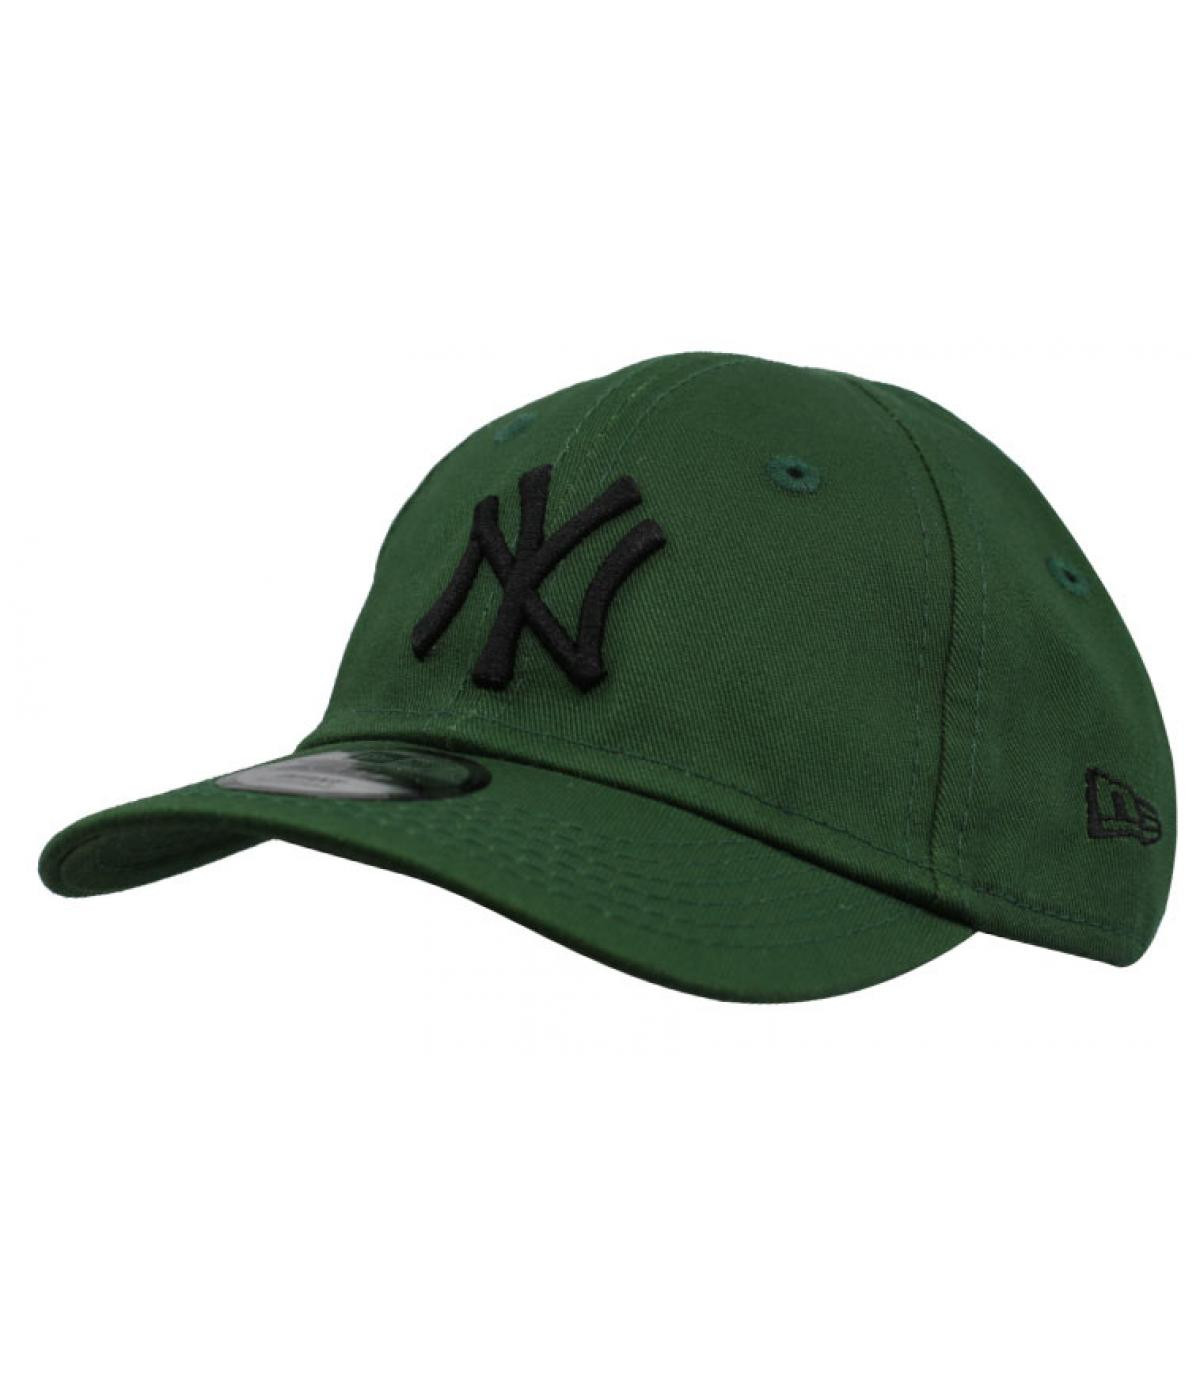 Details Infant League Ess NY green black - afbeeling 2